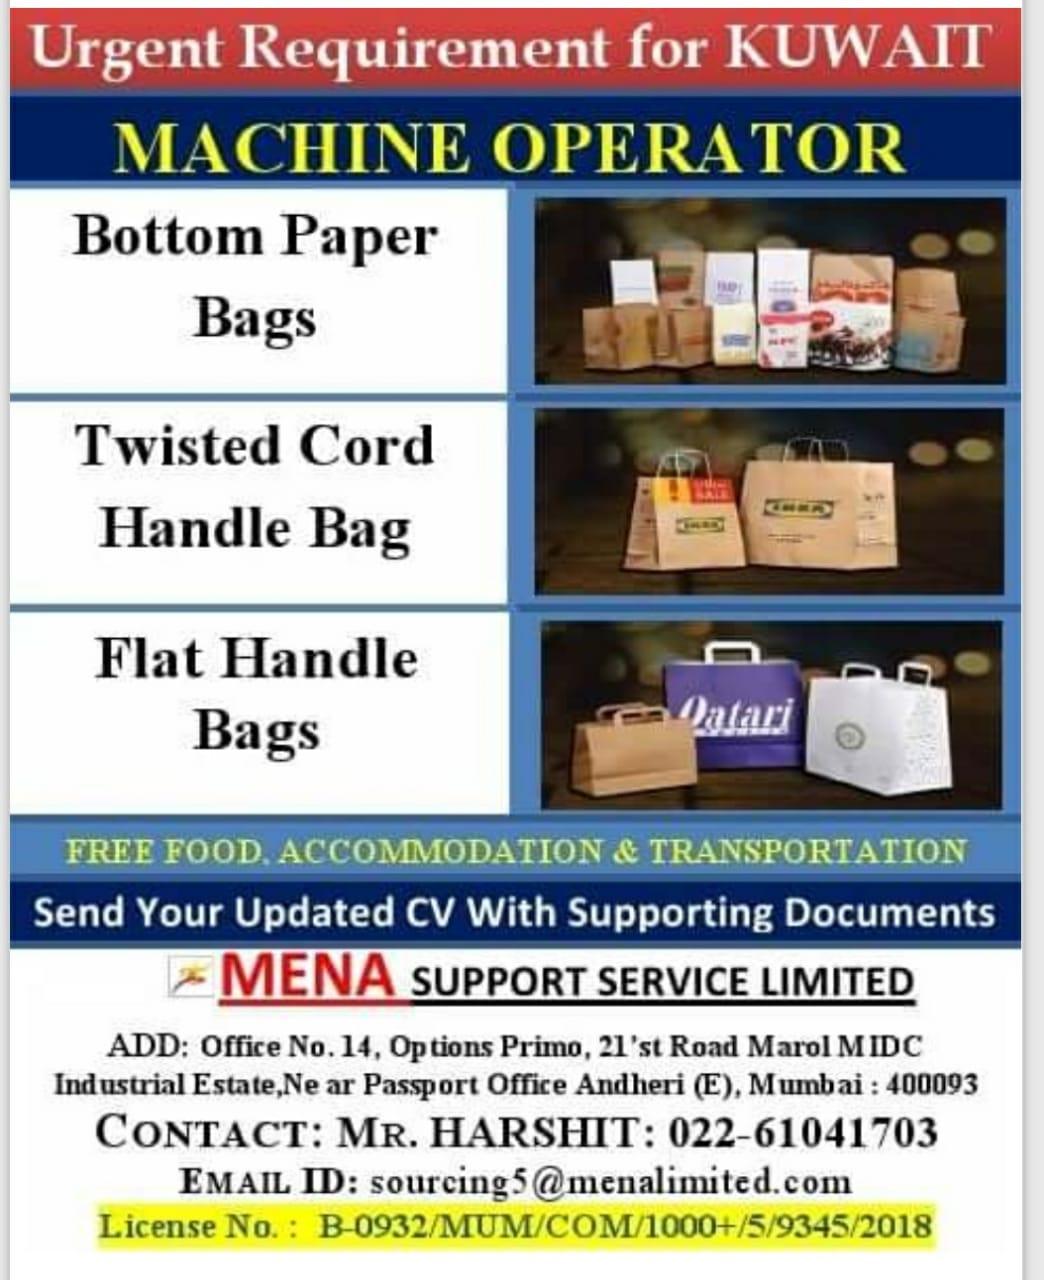 URGENT REQUIREMENT FOR KUWAIT MACHINE OPERATOR